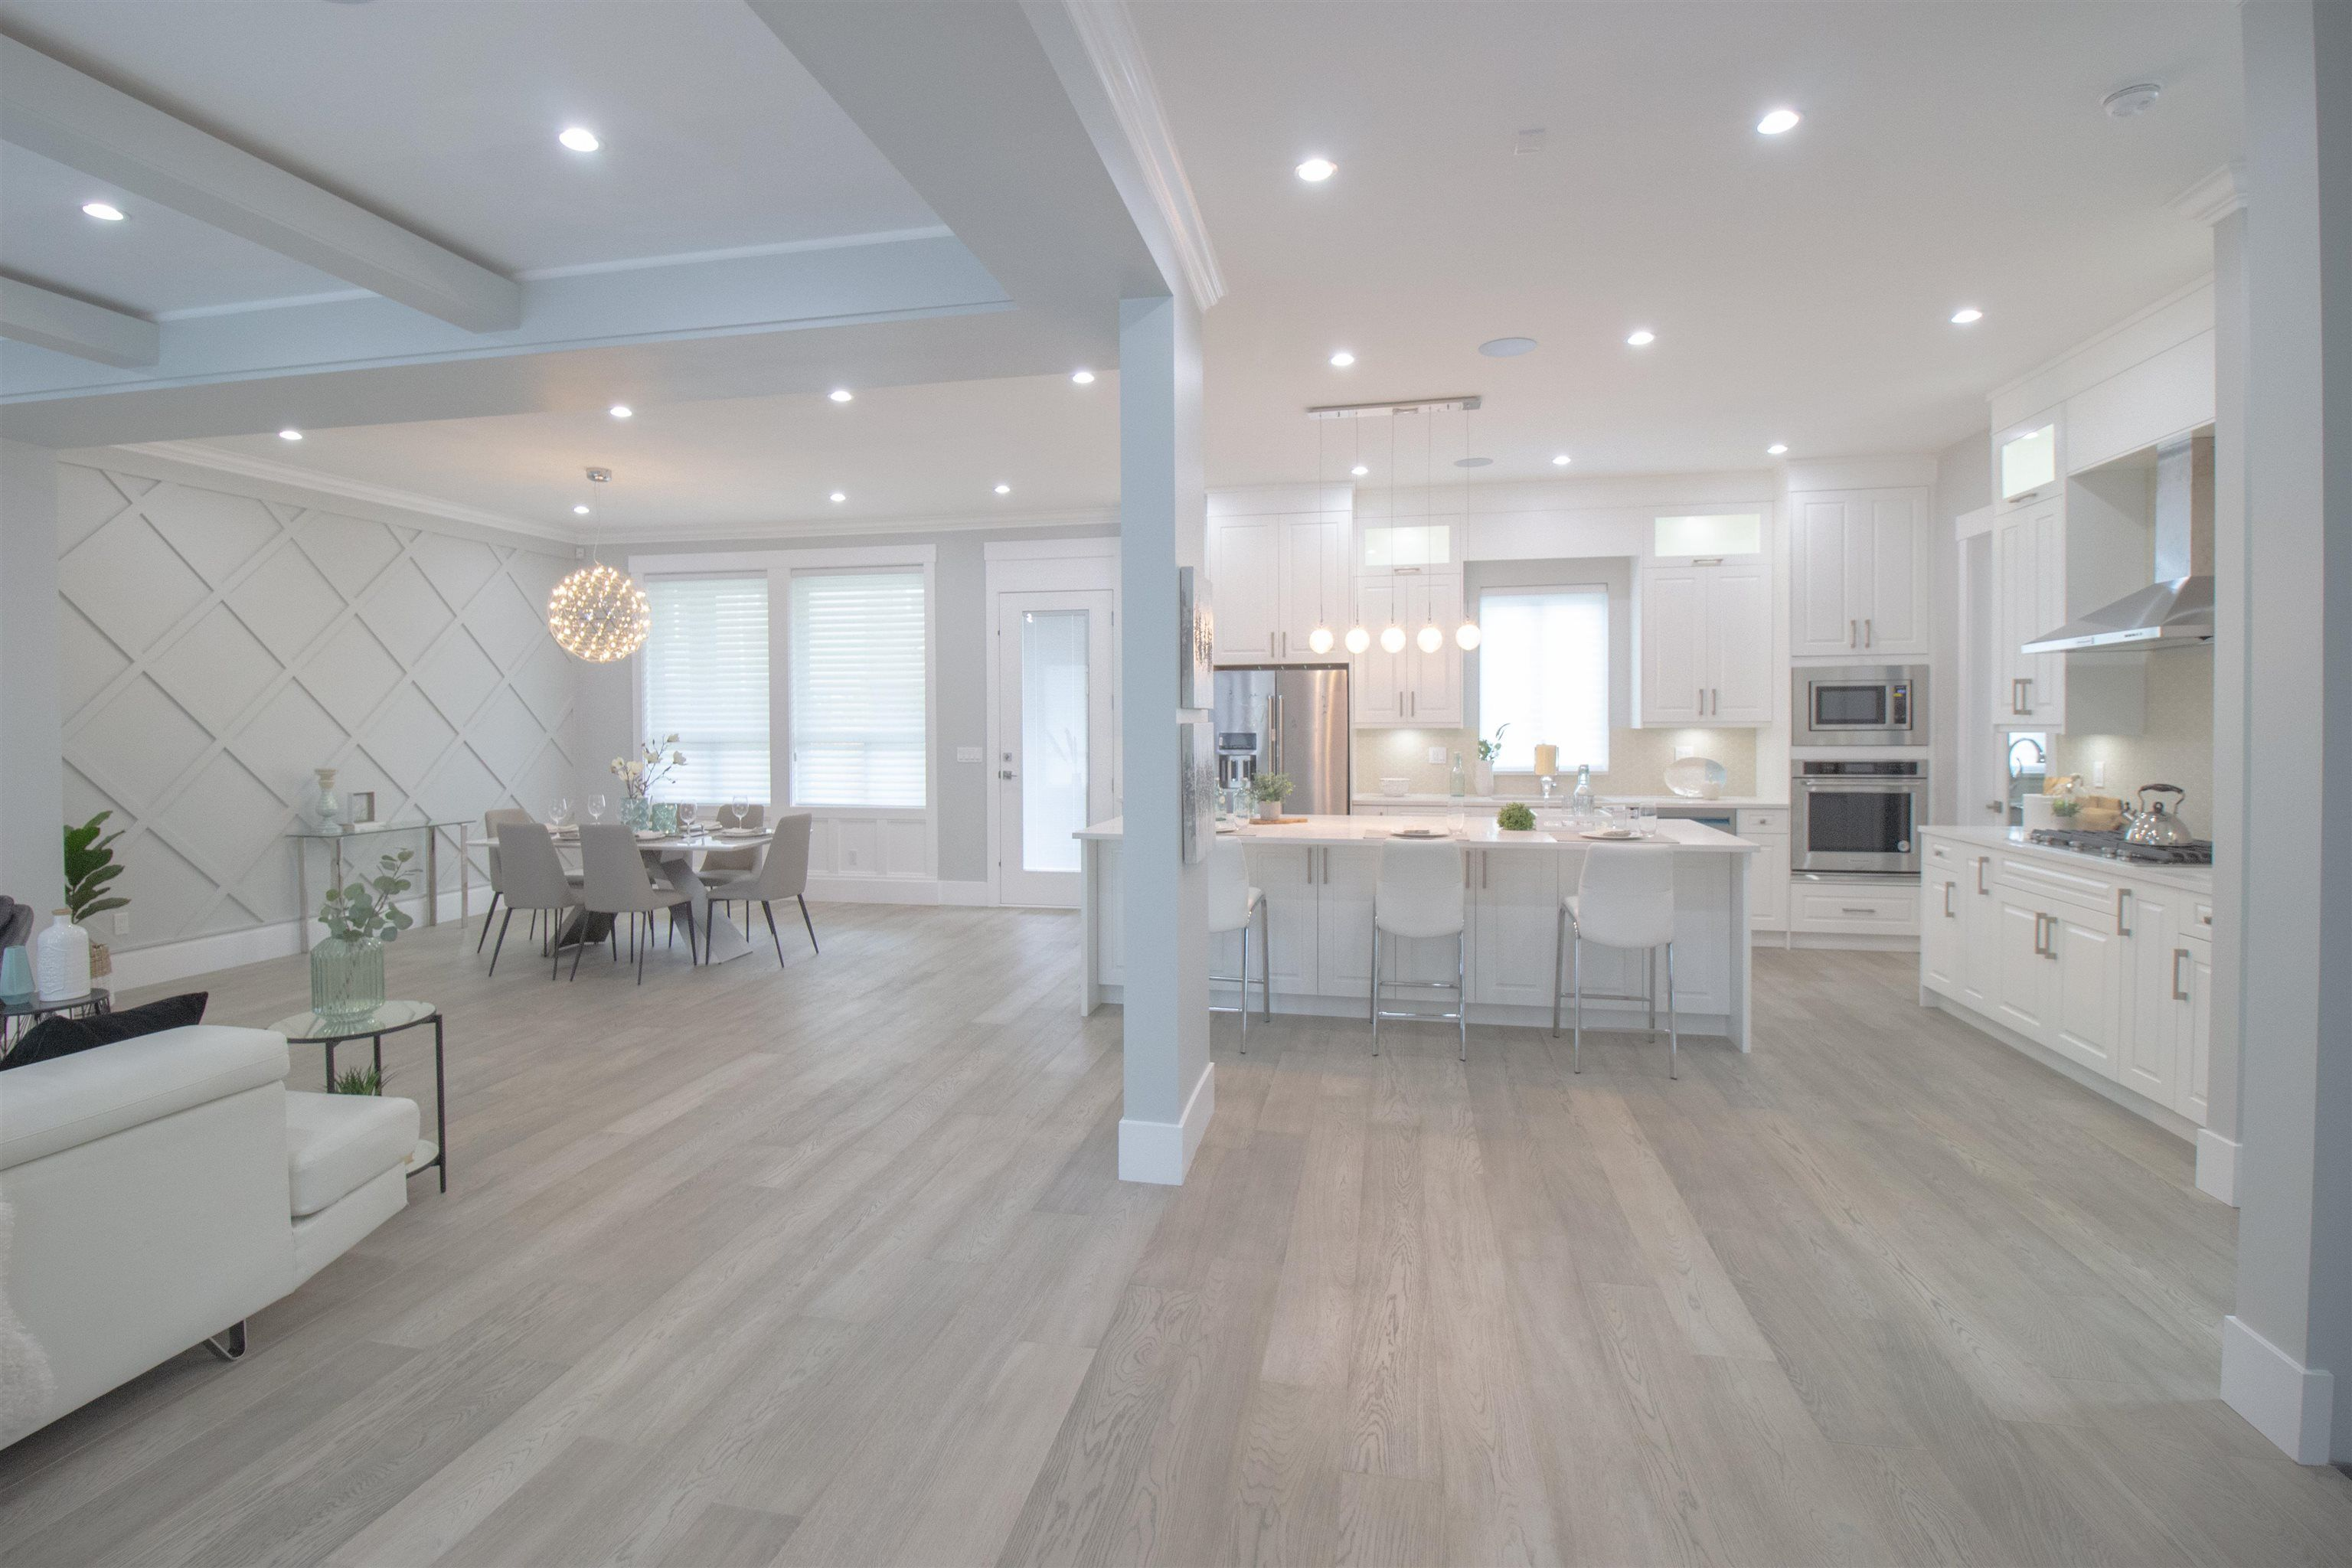 Main Photo: 14270 61B Avenue in Surrey: Sullivan Station House for sale : MLS®# R2620228